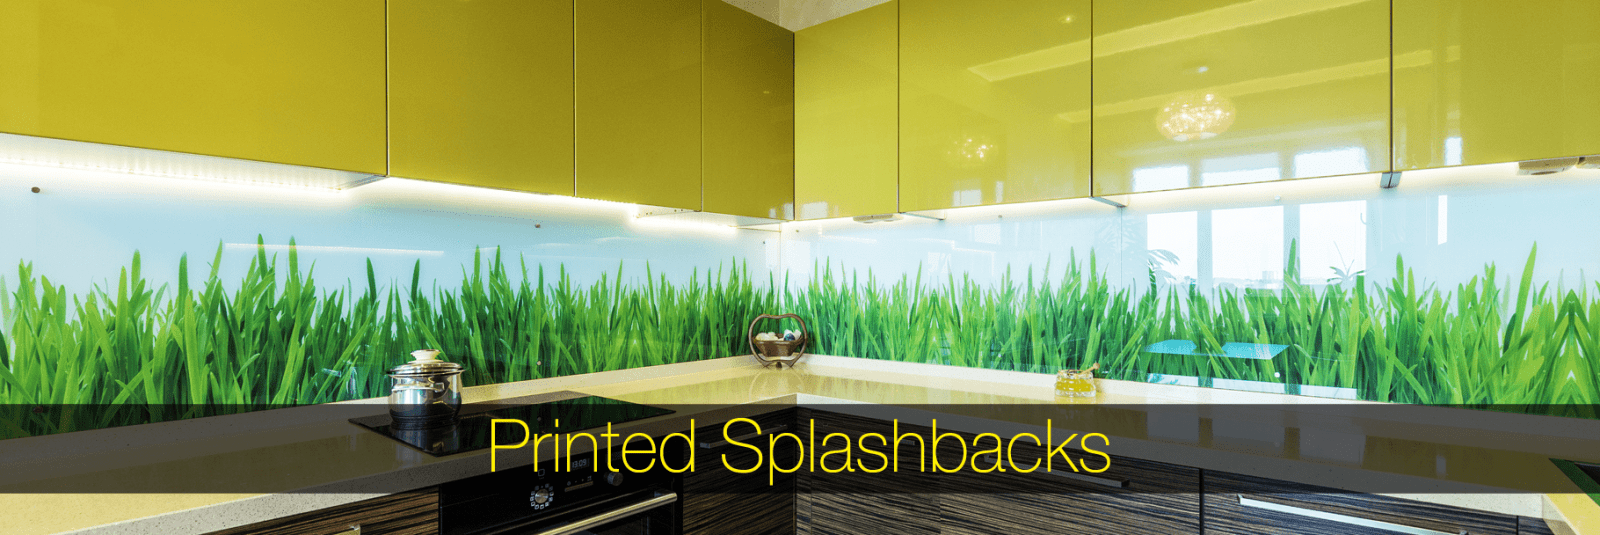 Product Categories Glass Splashbacks